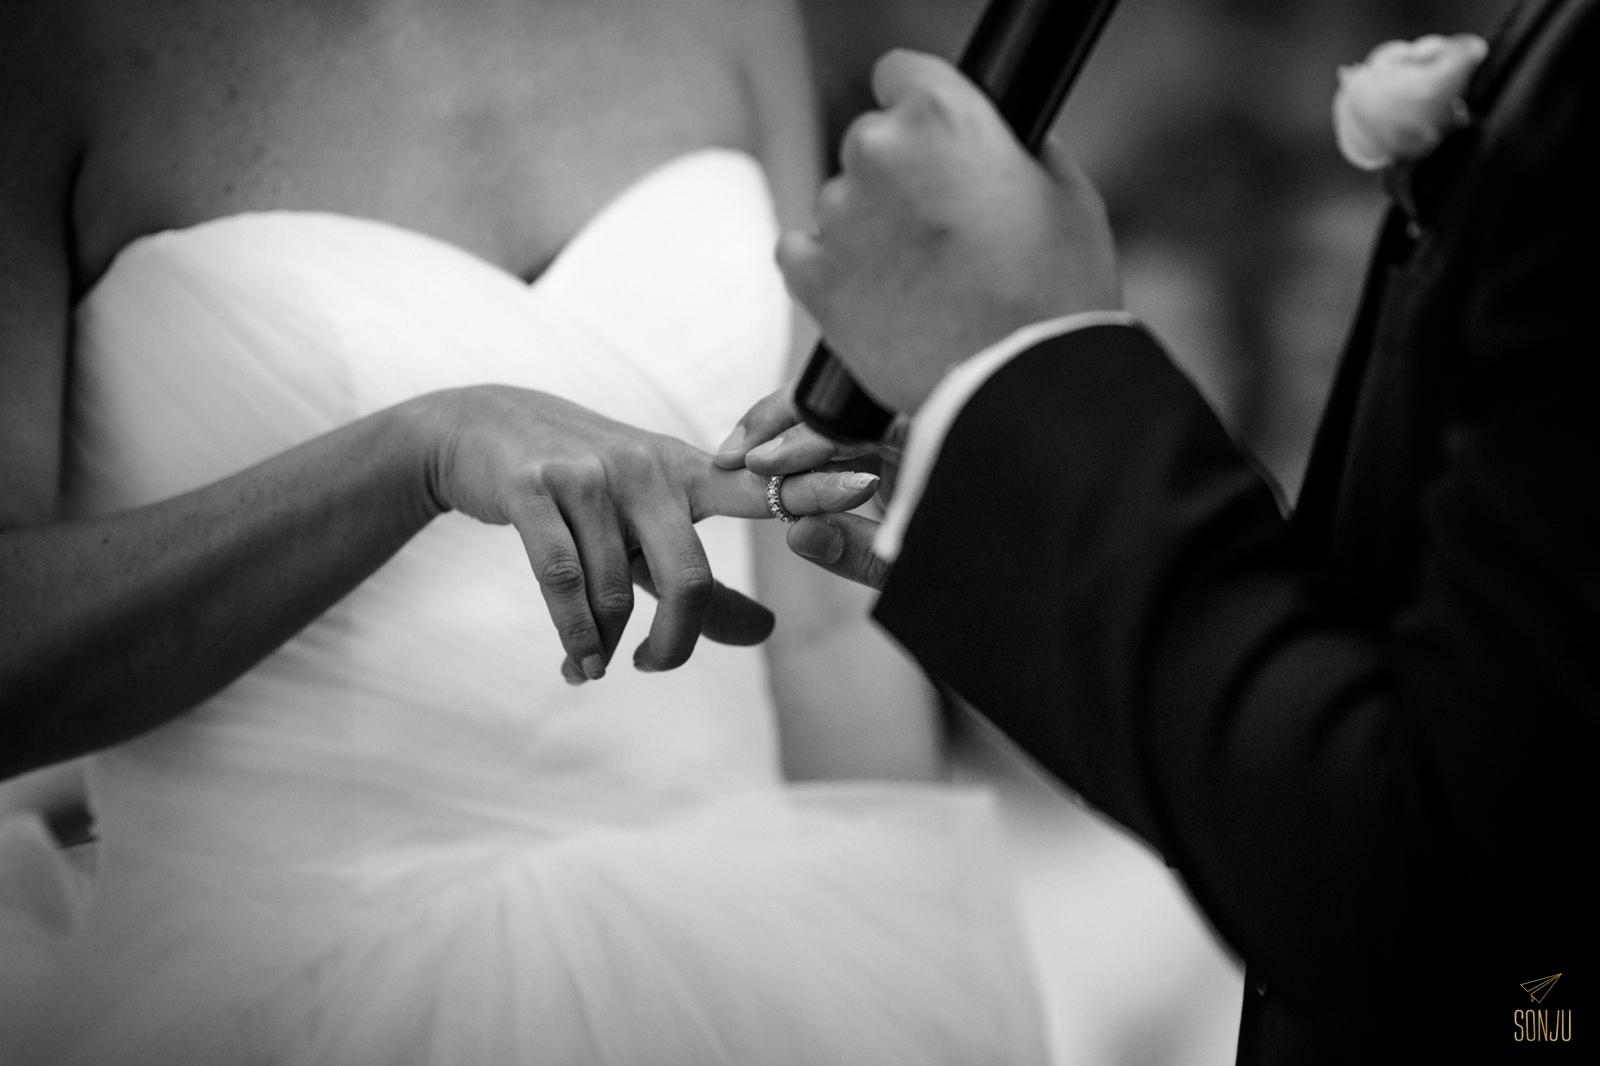 W-Fort-Lauderdale-Wedding-Photographer-South-Florida-Weddings-Michelle-Eric-Sonju00024.jpg